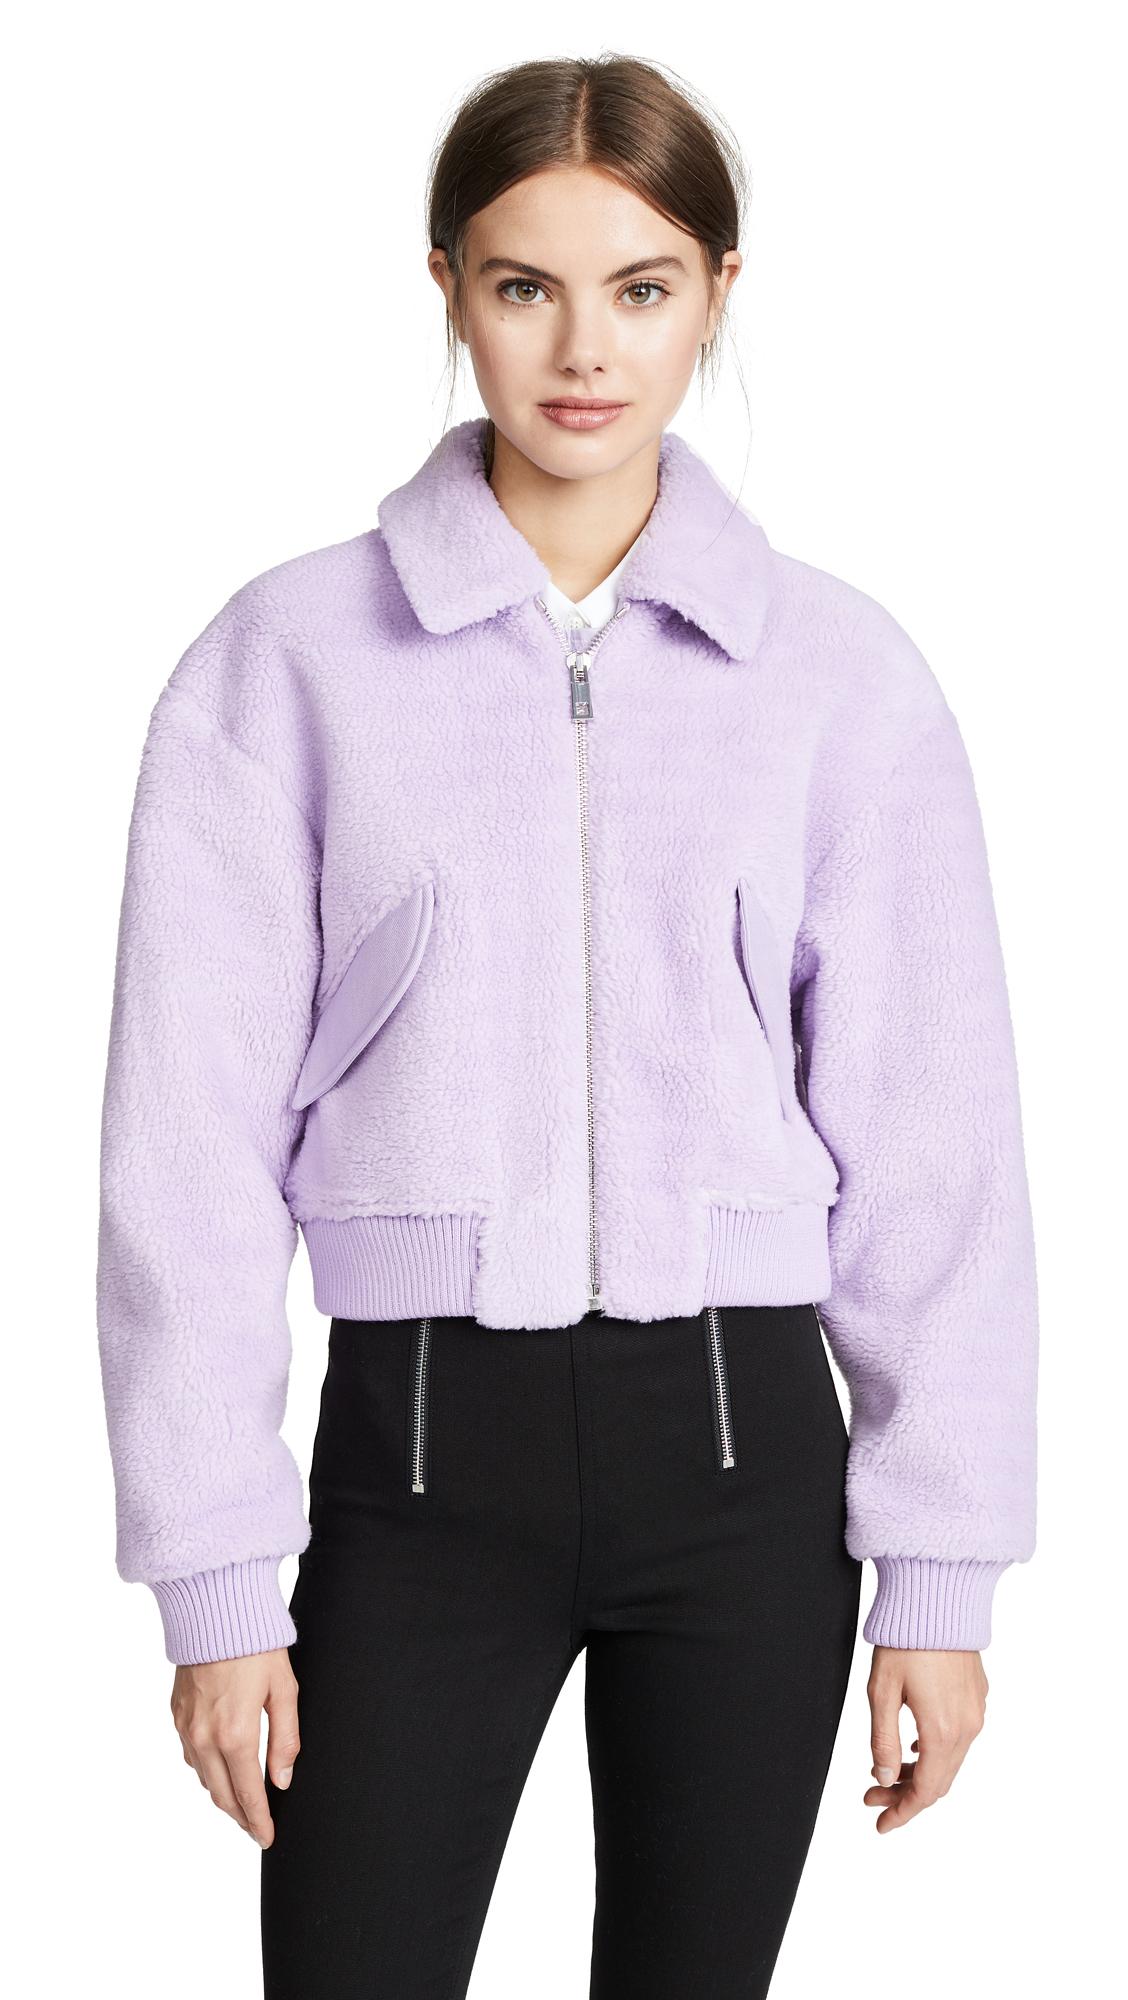 Tibi Gus Cropped Jacket In Lavender